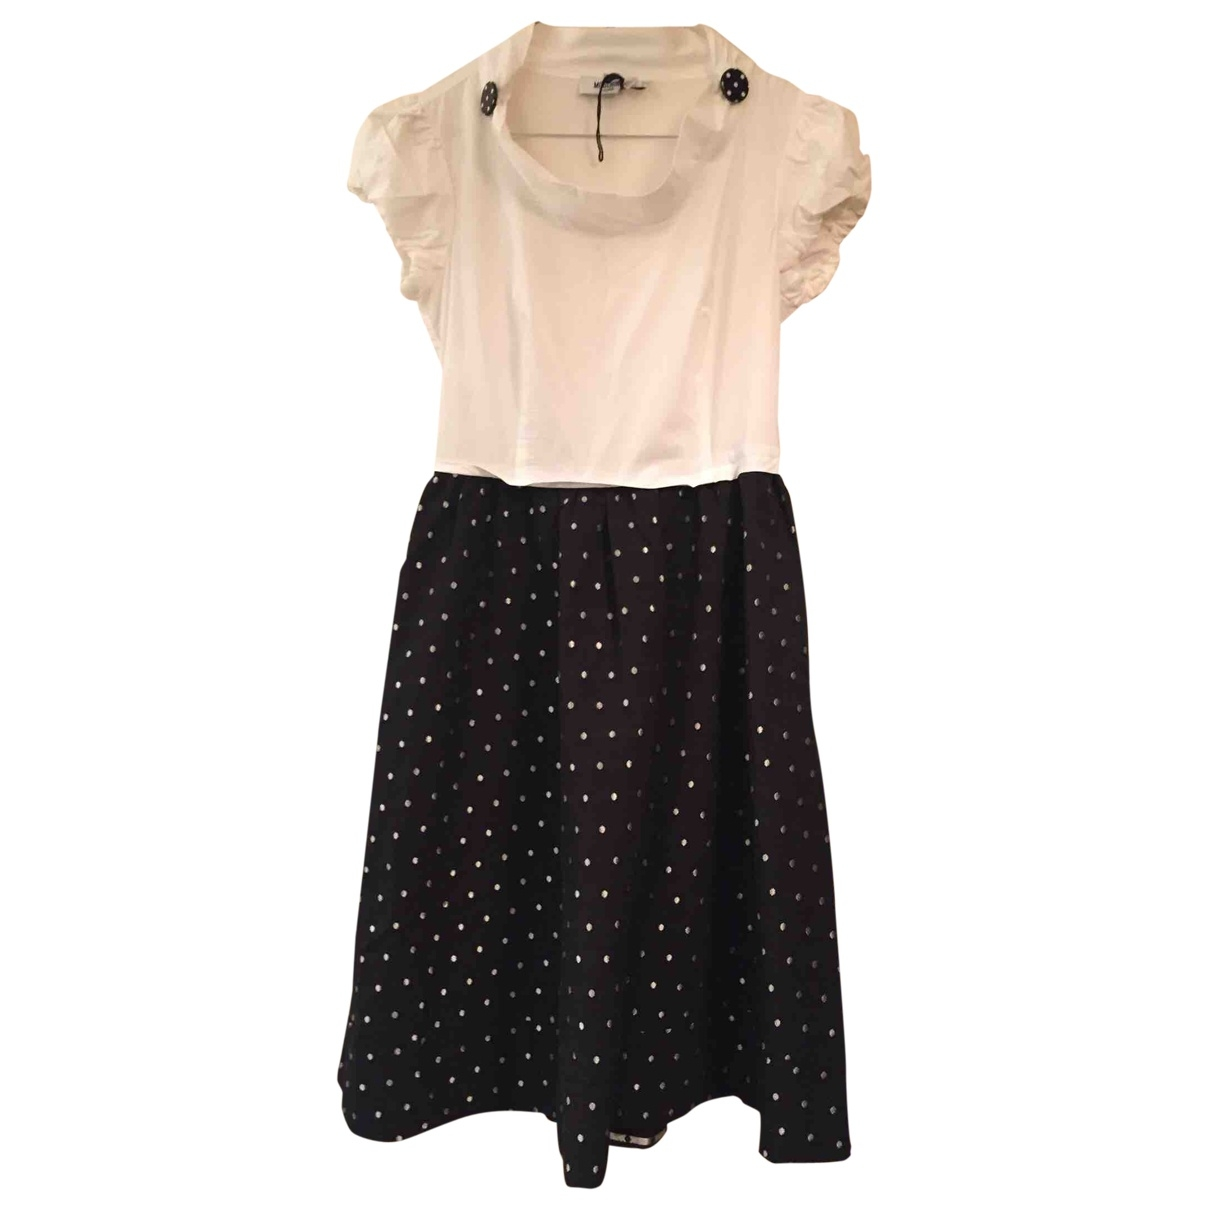 Moschino \N Black Cotton dress for Women 38 IT